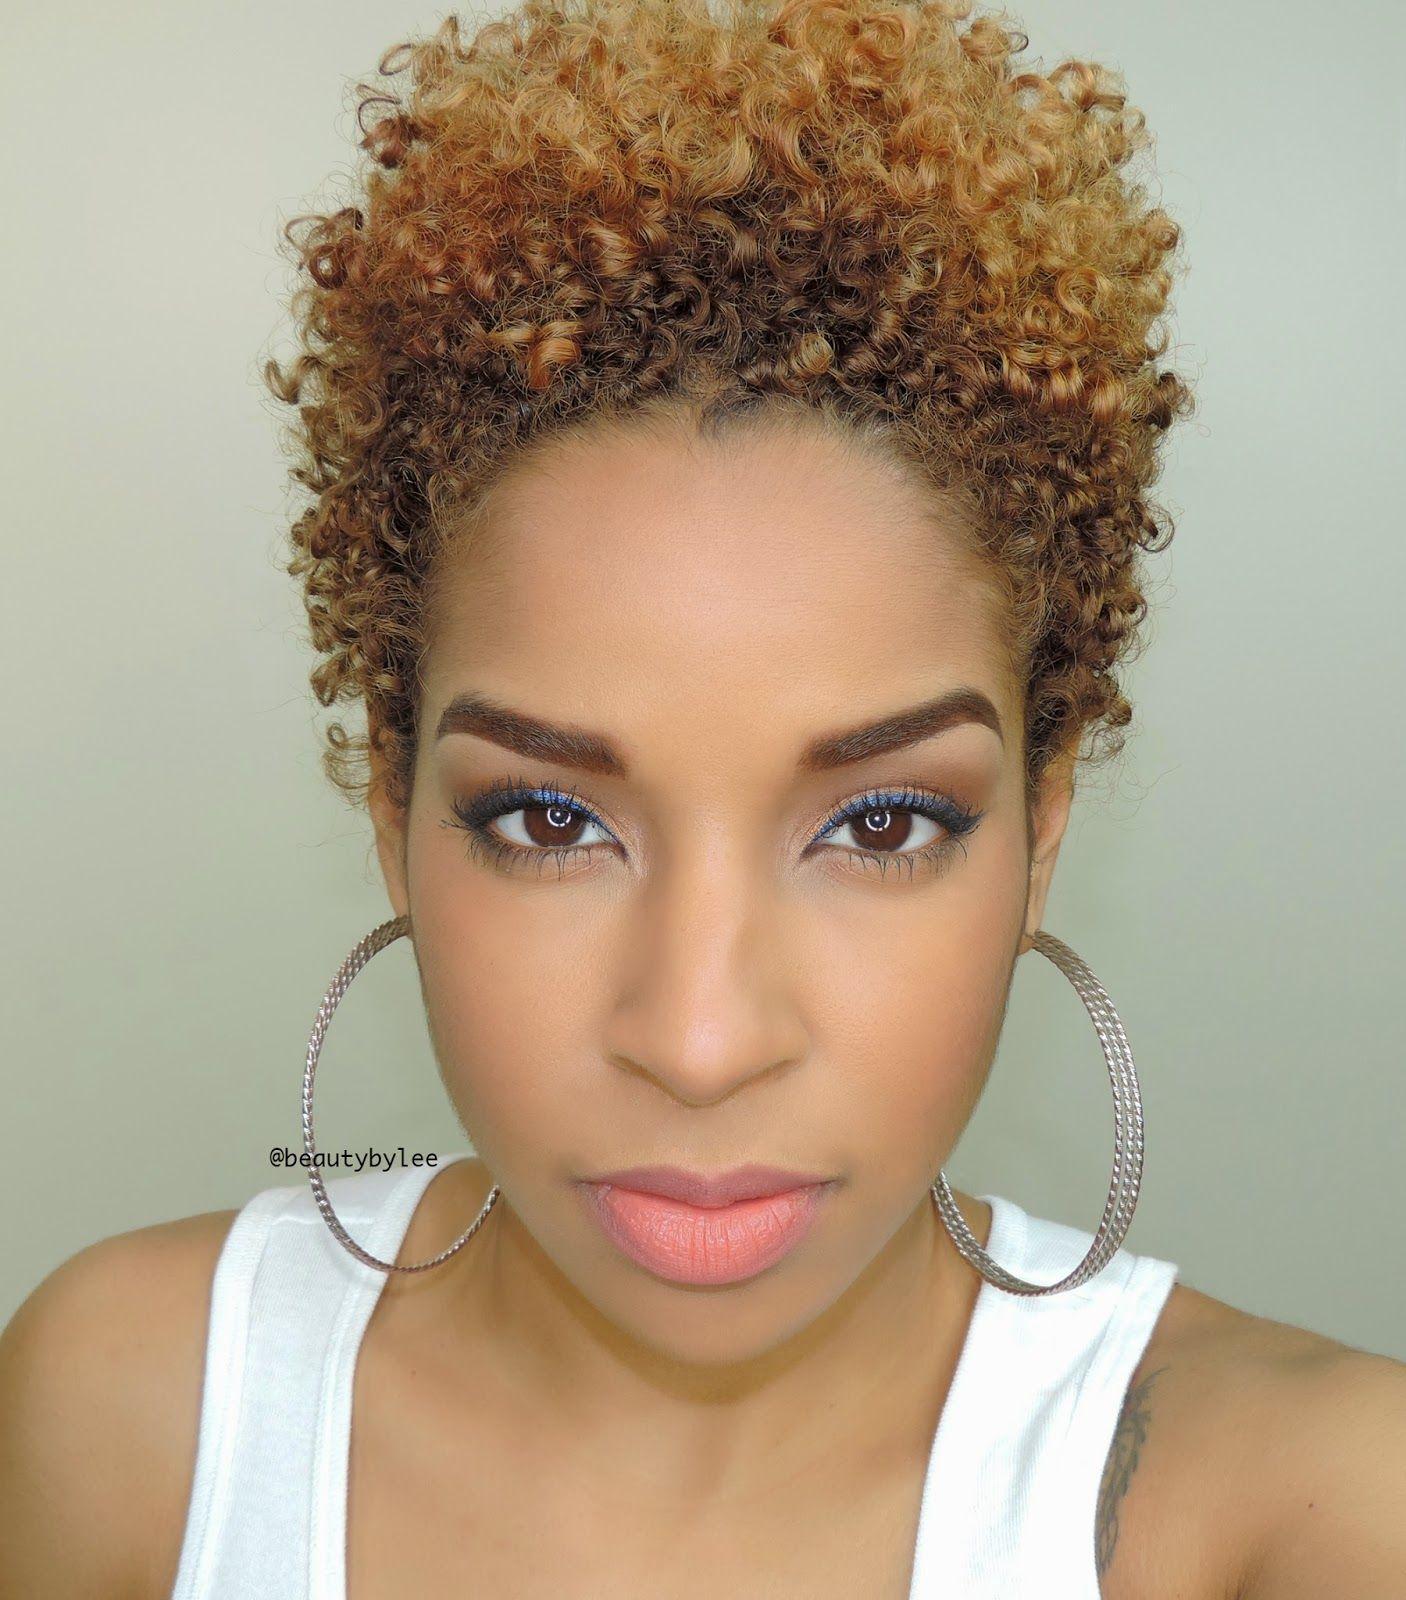 Beauty By Lee httpsharonedemmyorganogoldcom  Best of Short Hair Styles  Pinterest  Short